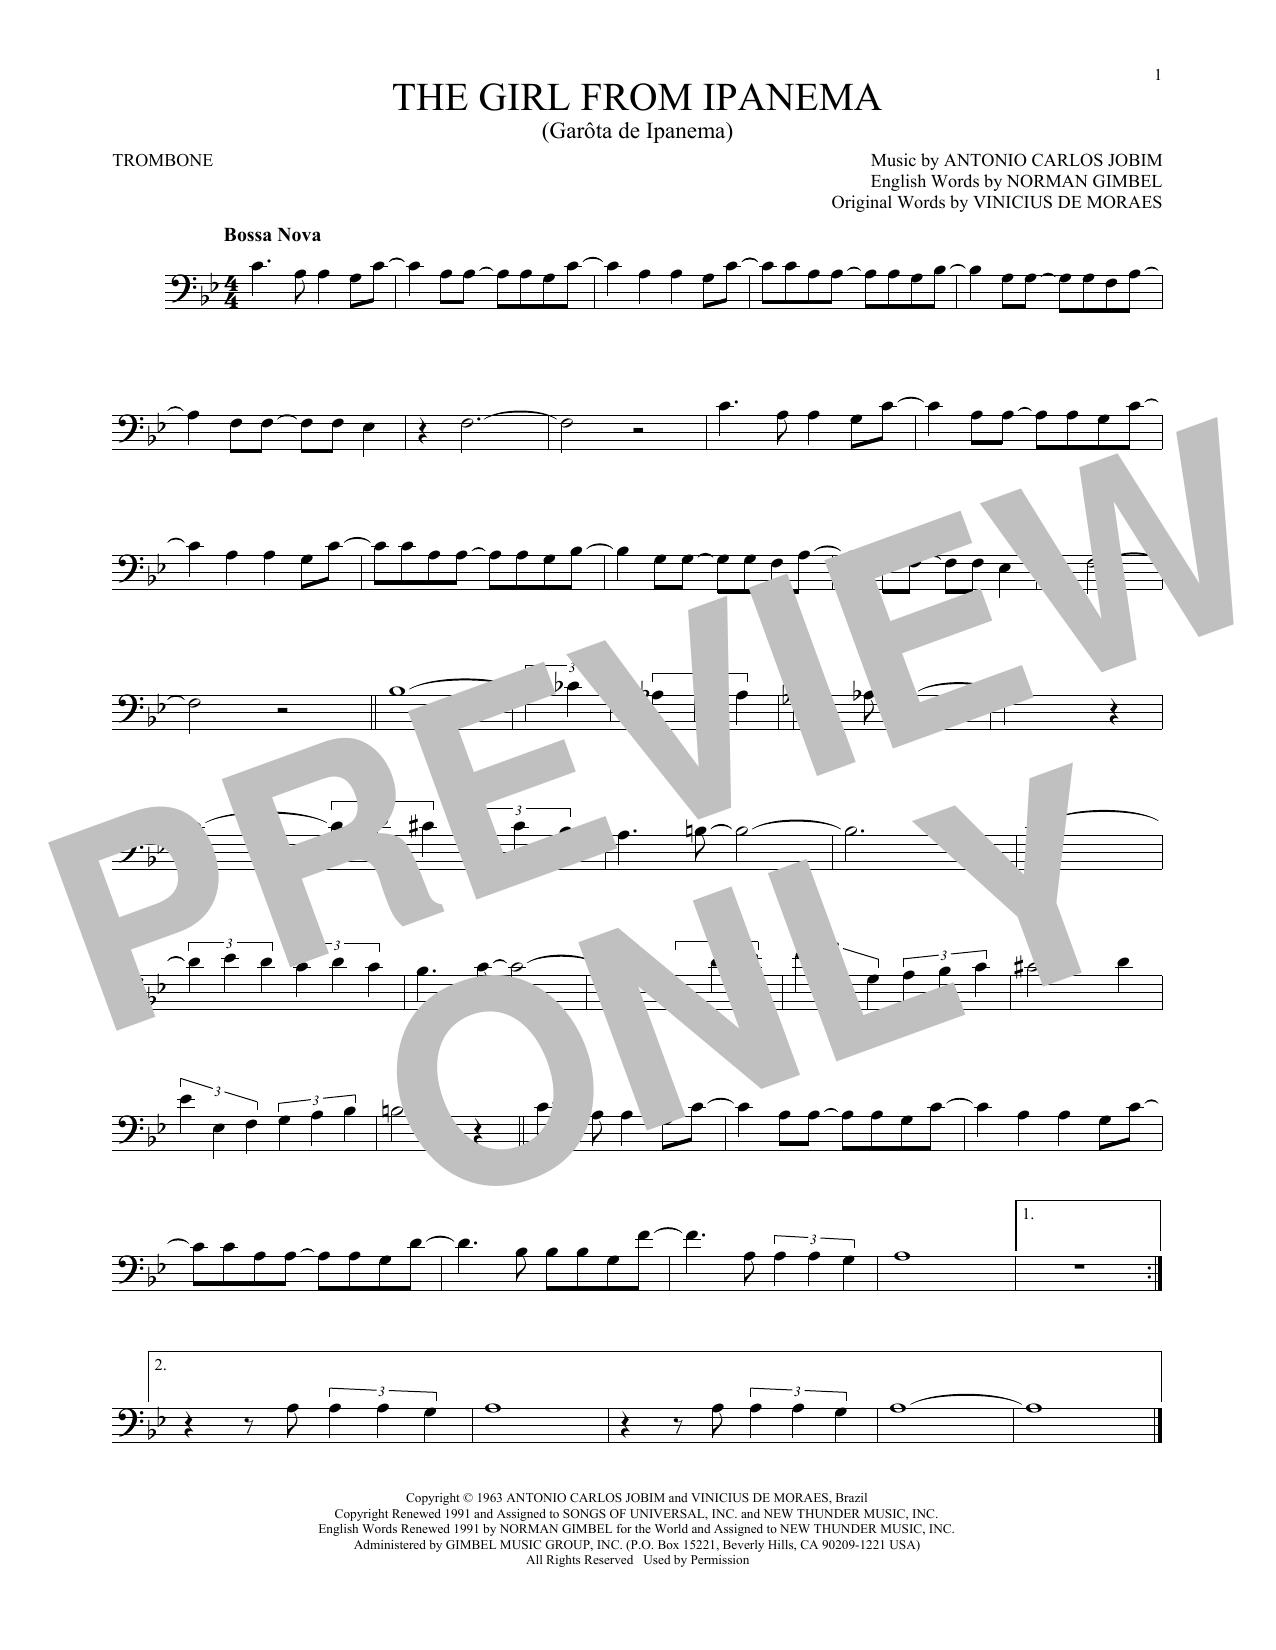 The Girl From Ipanema (Trombone Solo)